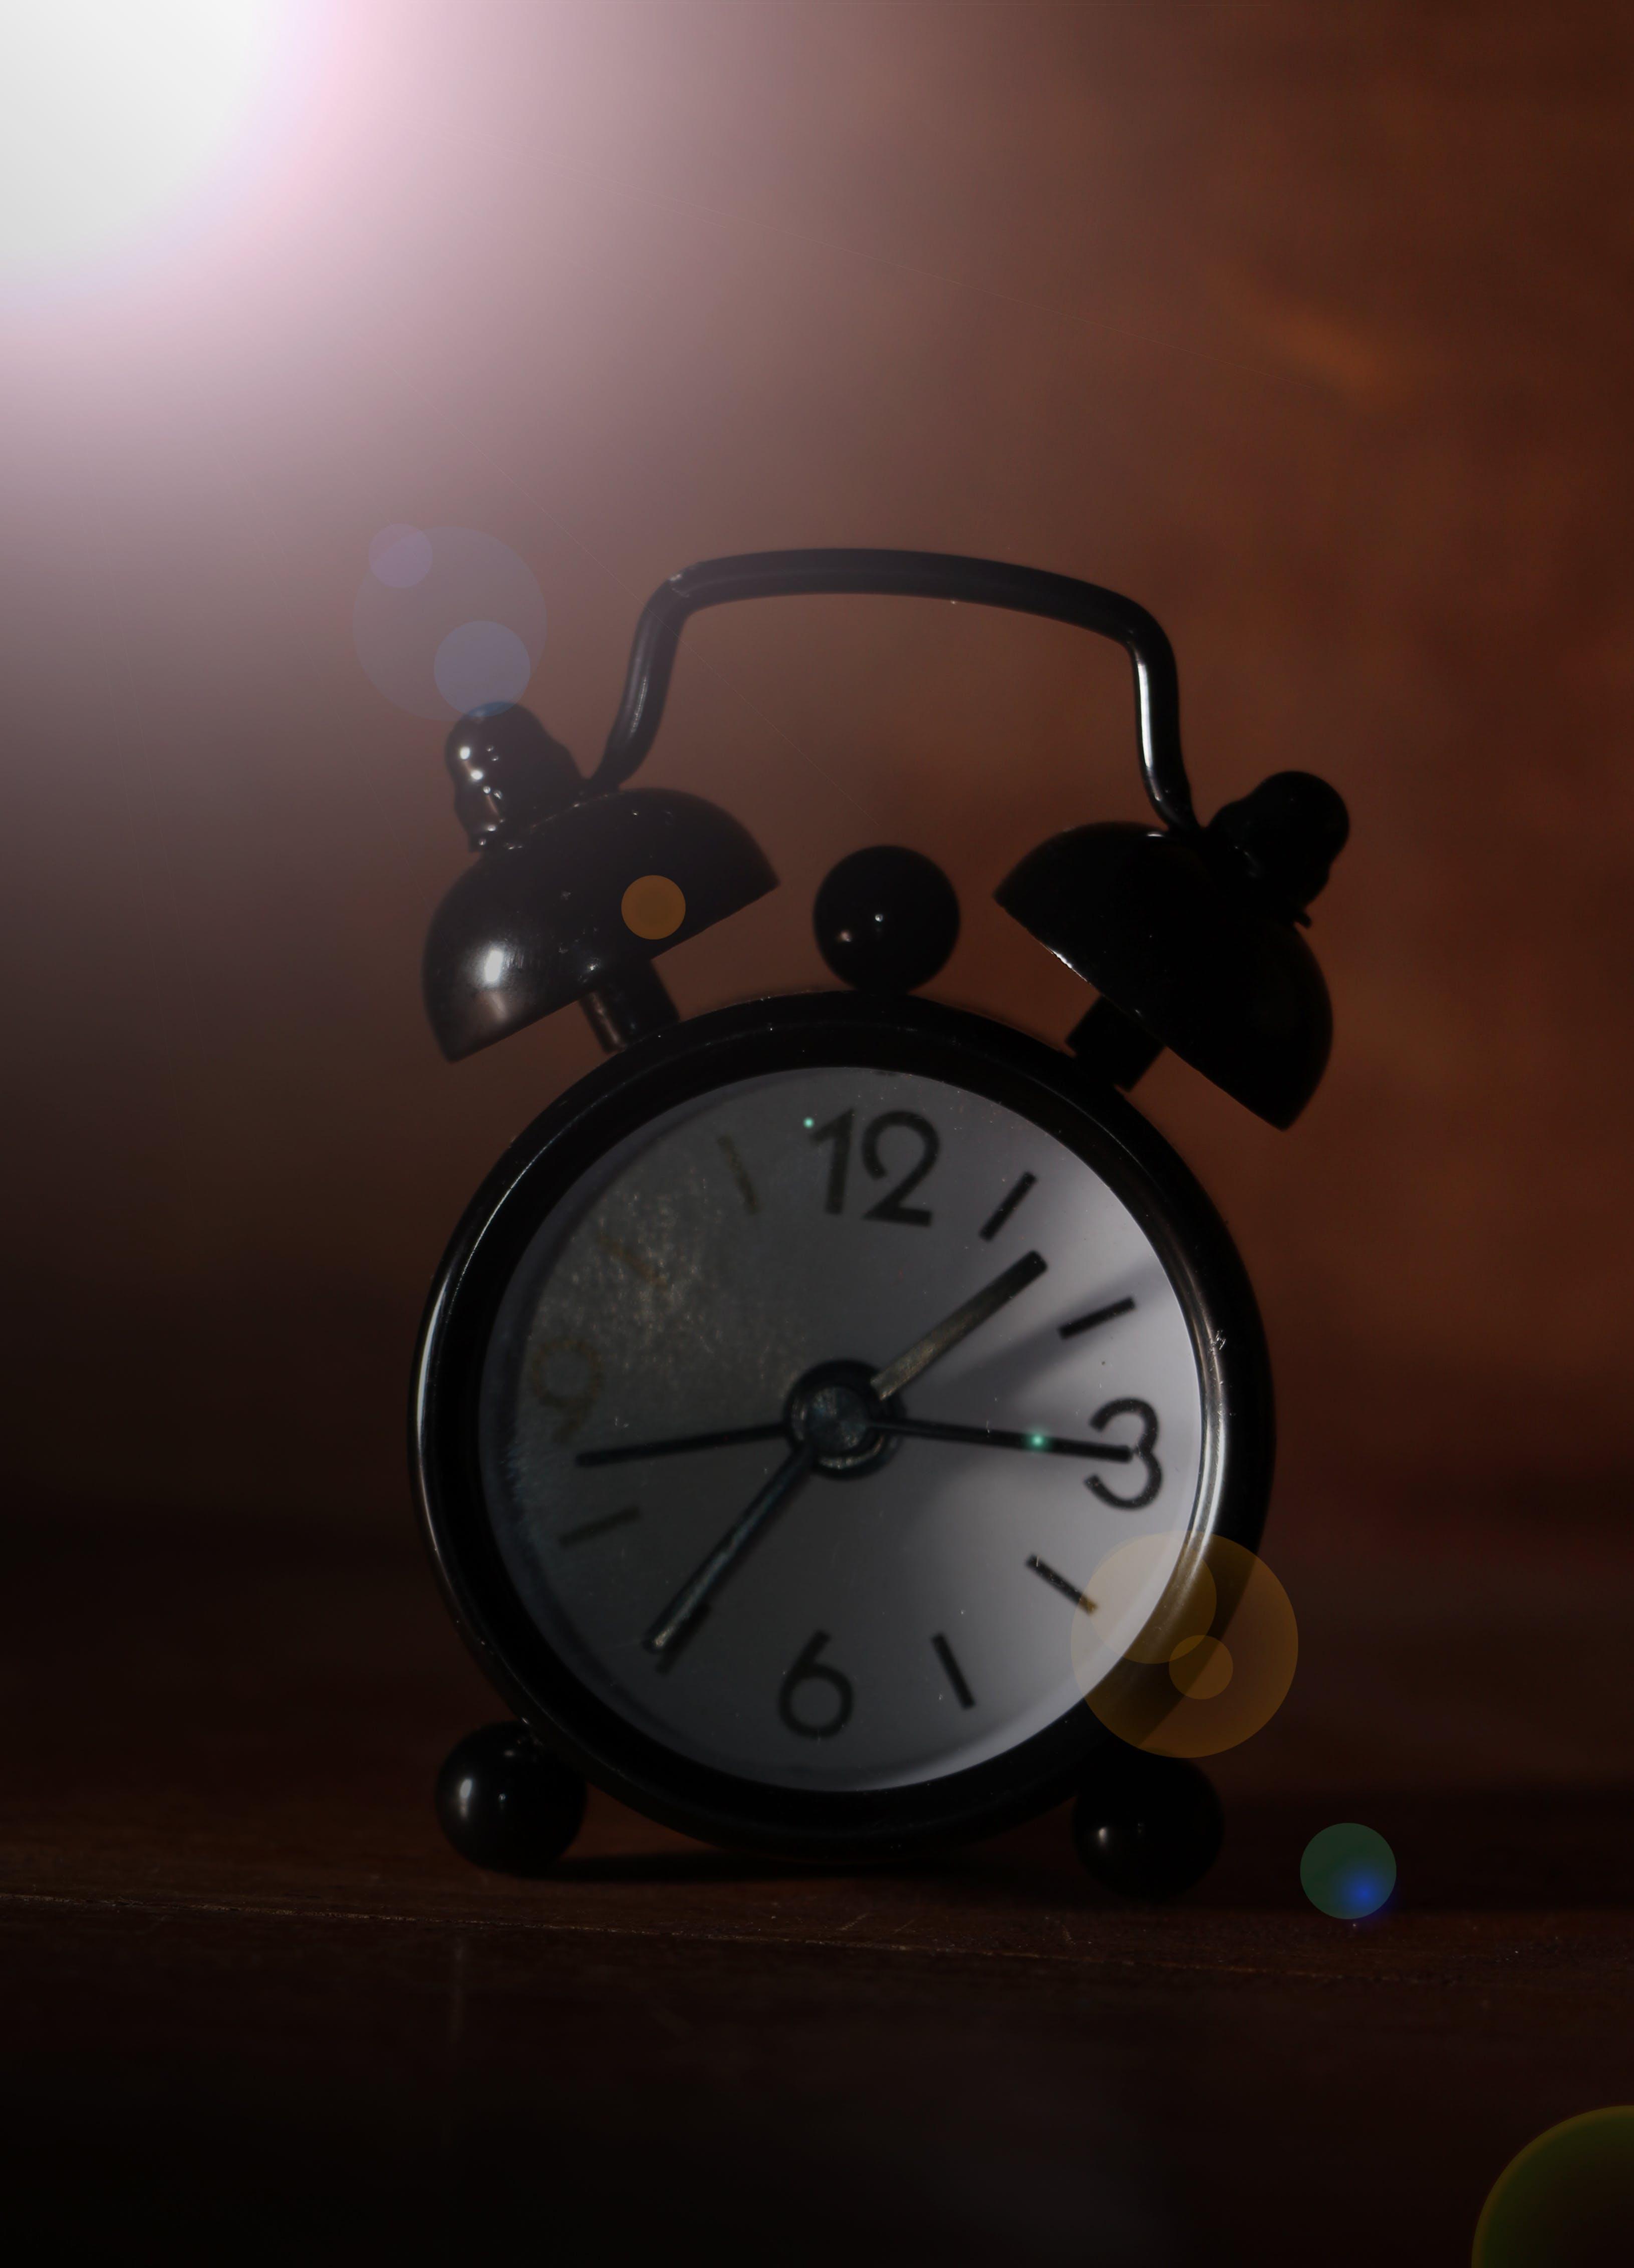 Free stock photo of alarm, alarm clock, bright, enjoy